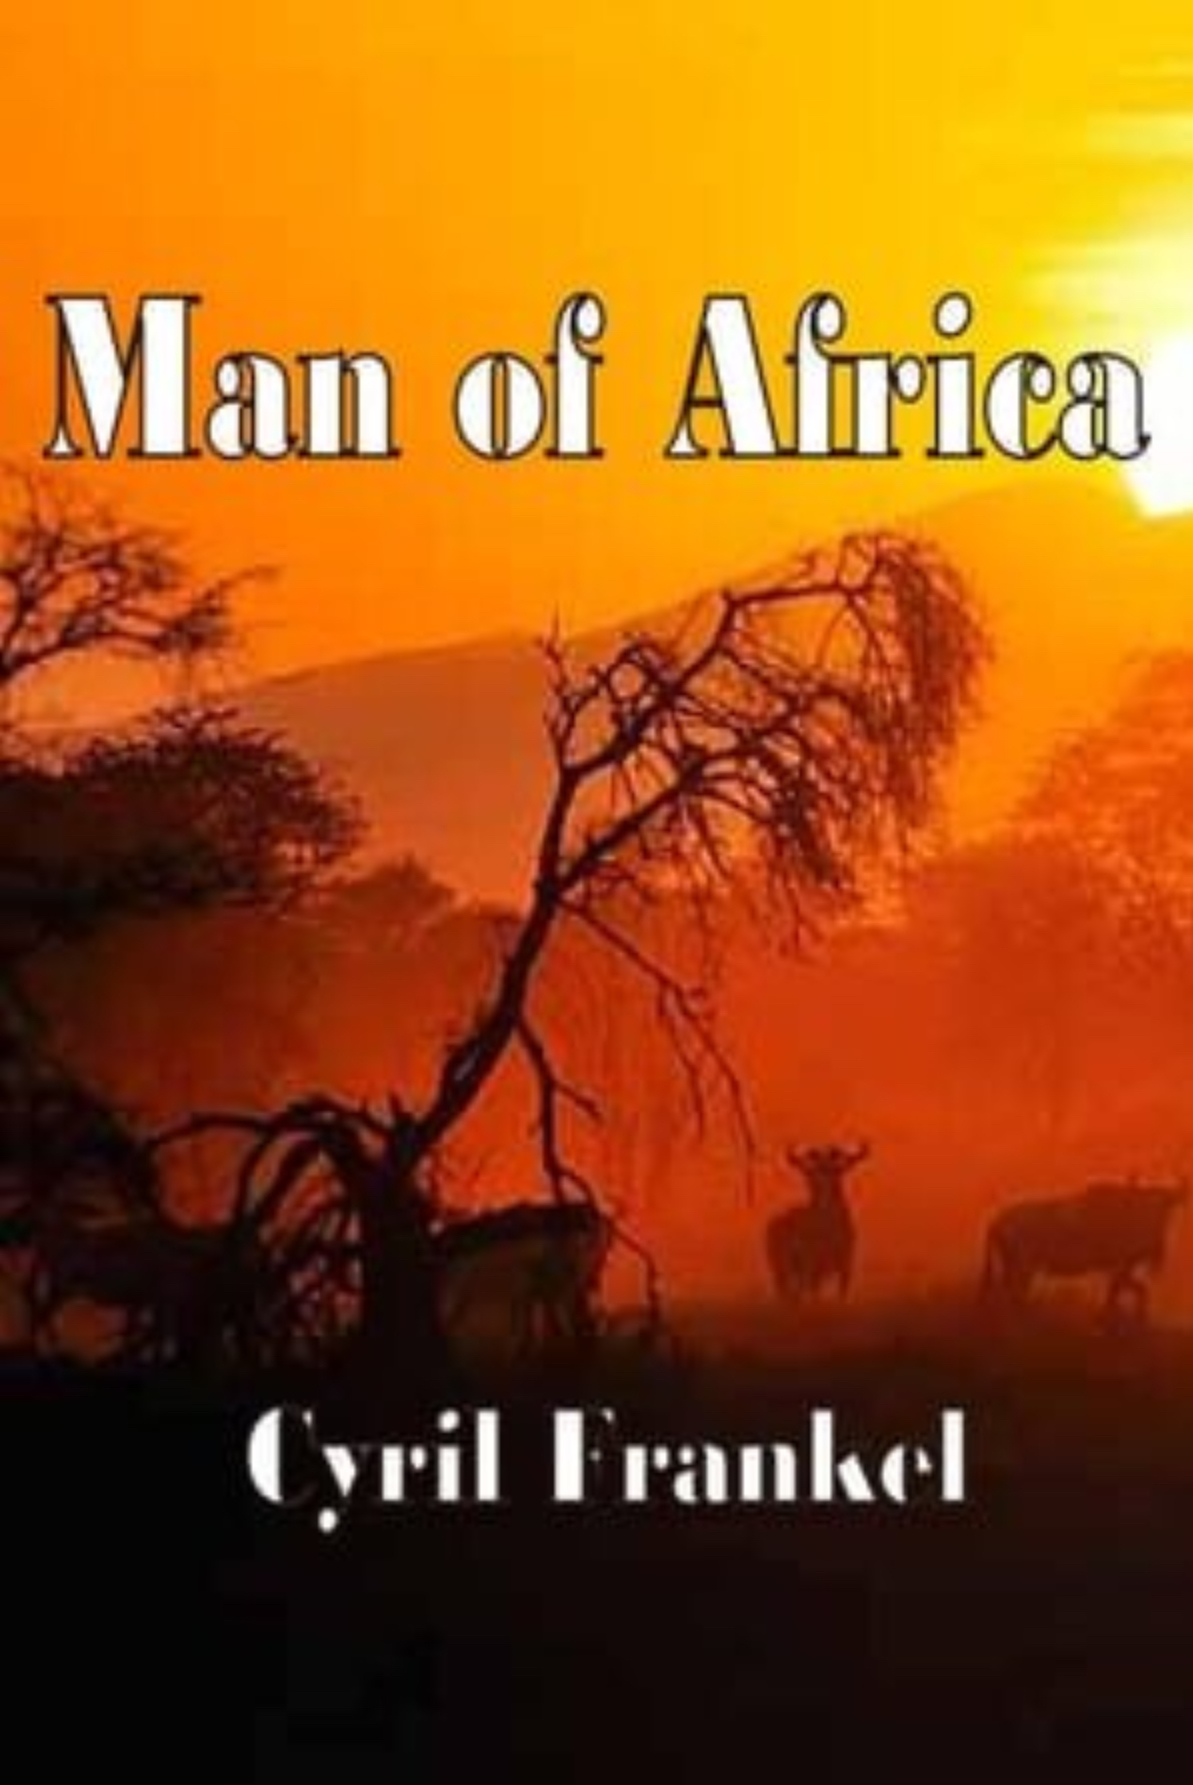 Man of Africa (1953) - IMDb